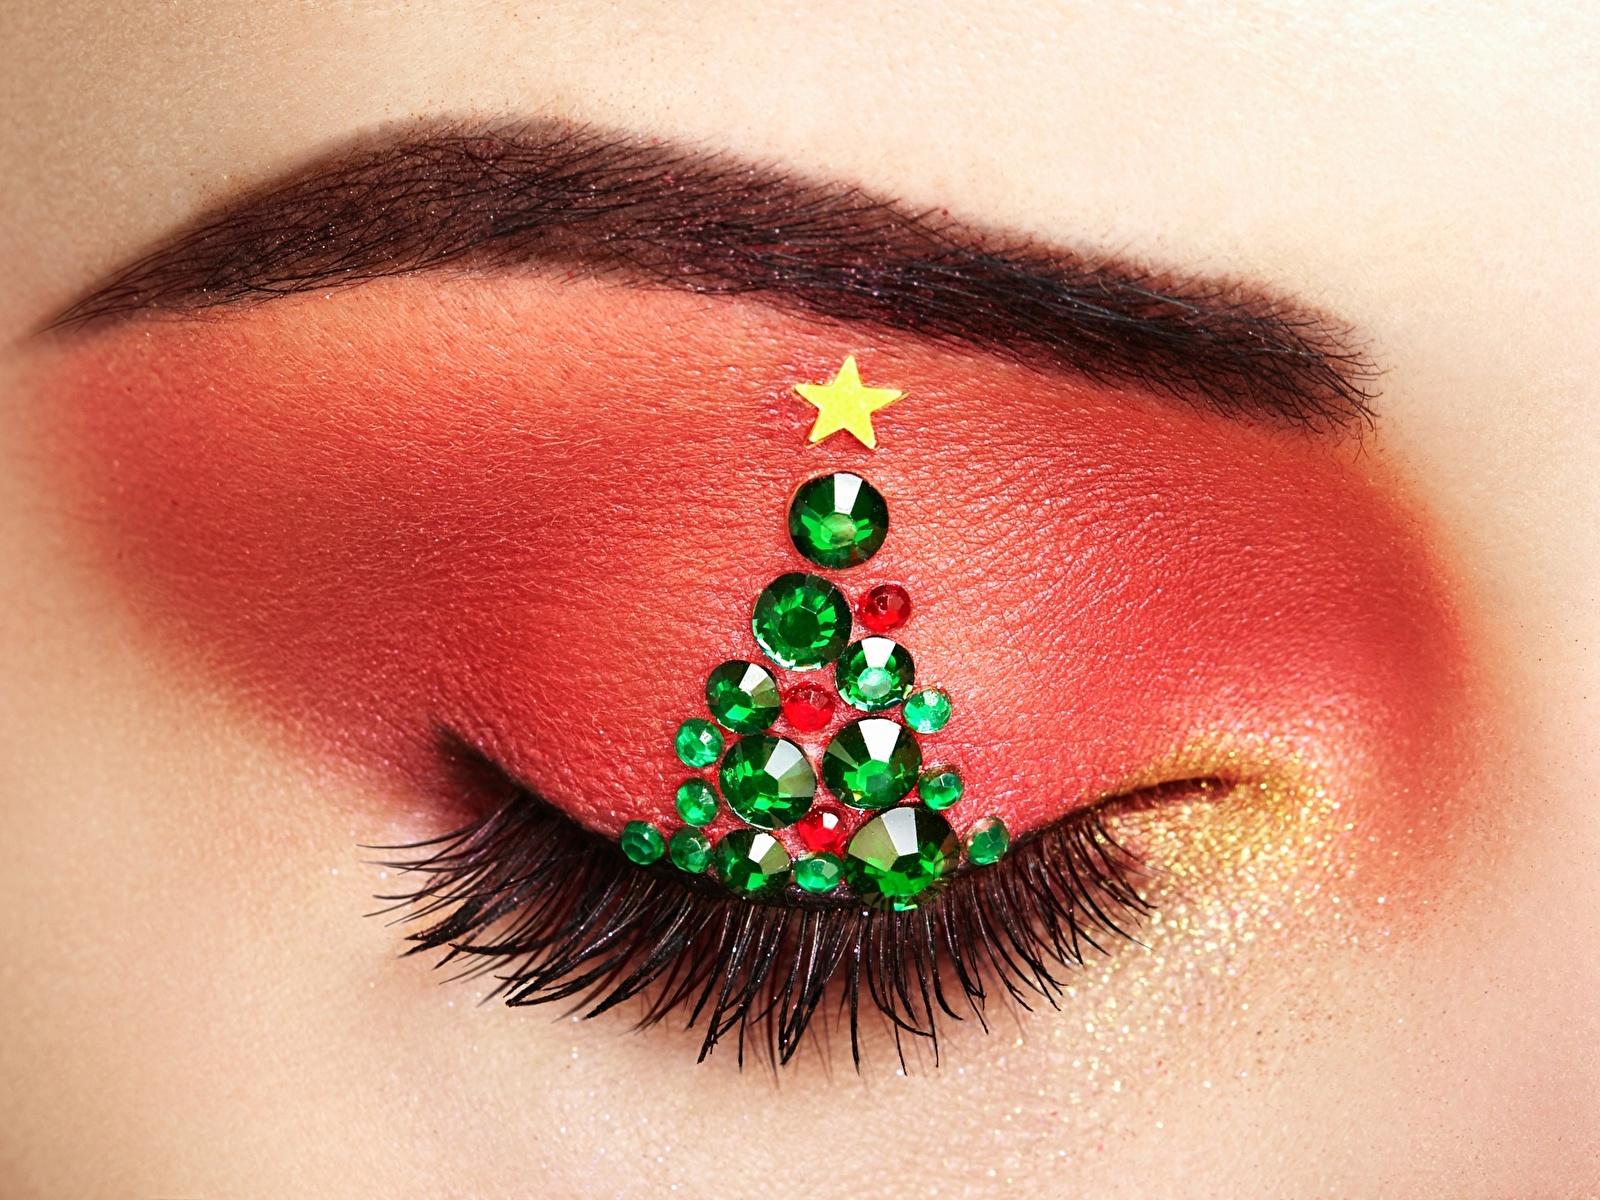 Images Eyelash lash Makeup New Year tree Closeup 1600x1200